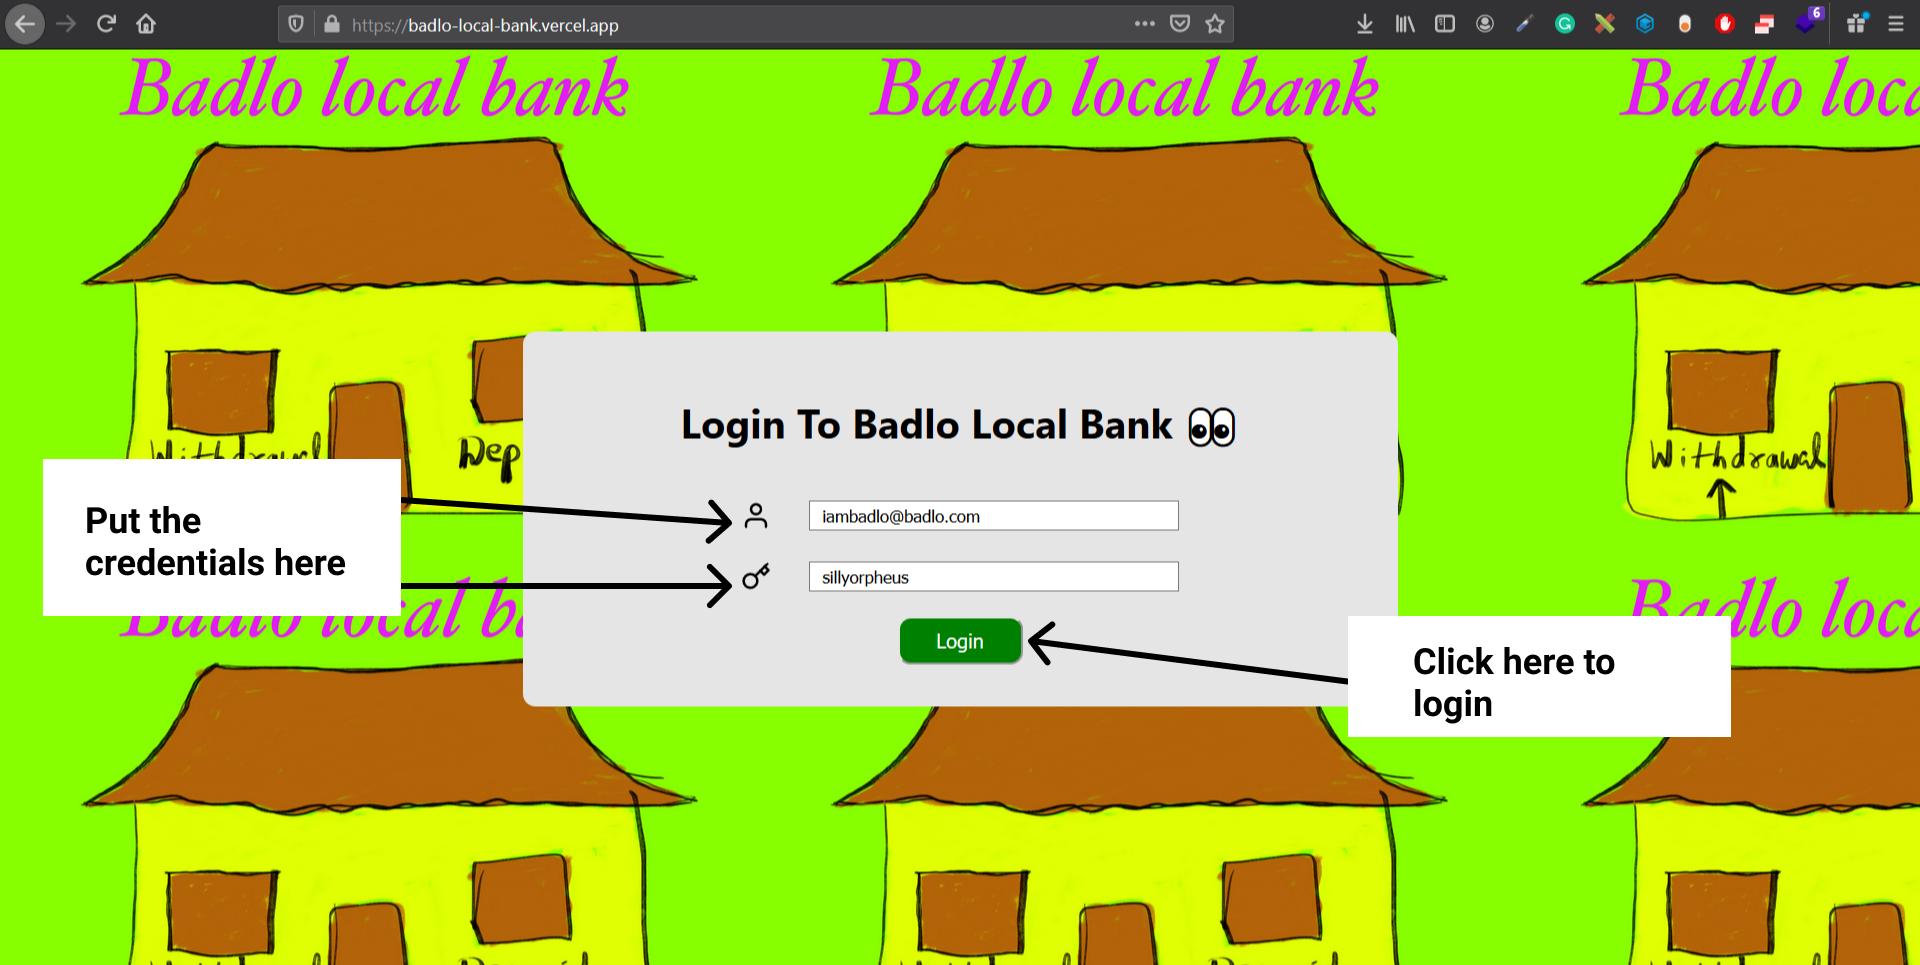 Website Credentials Image